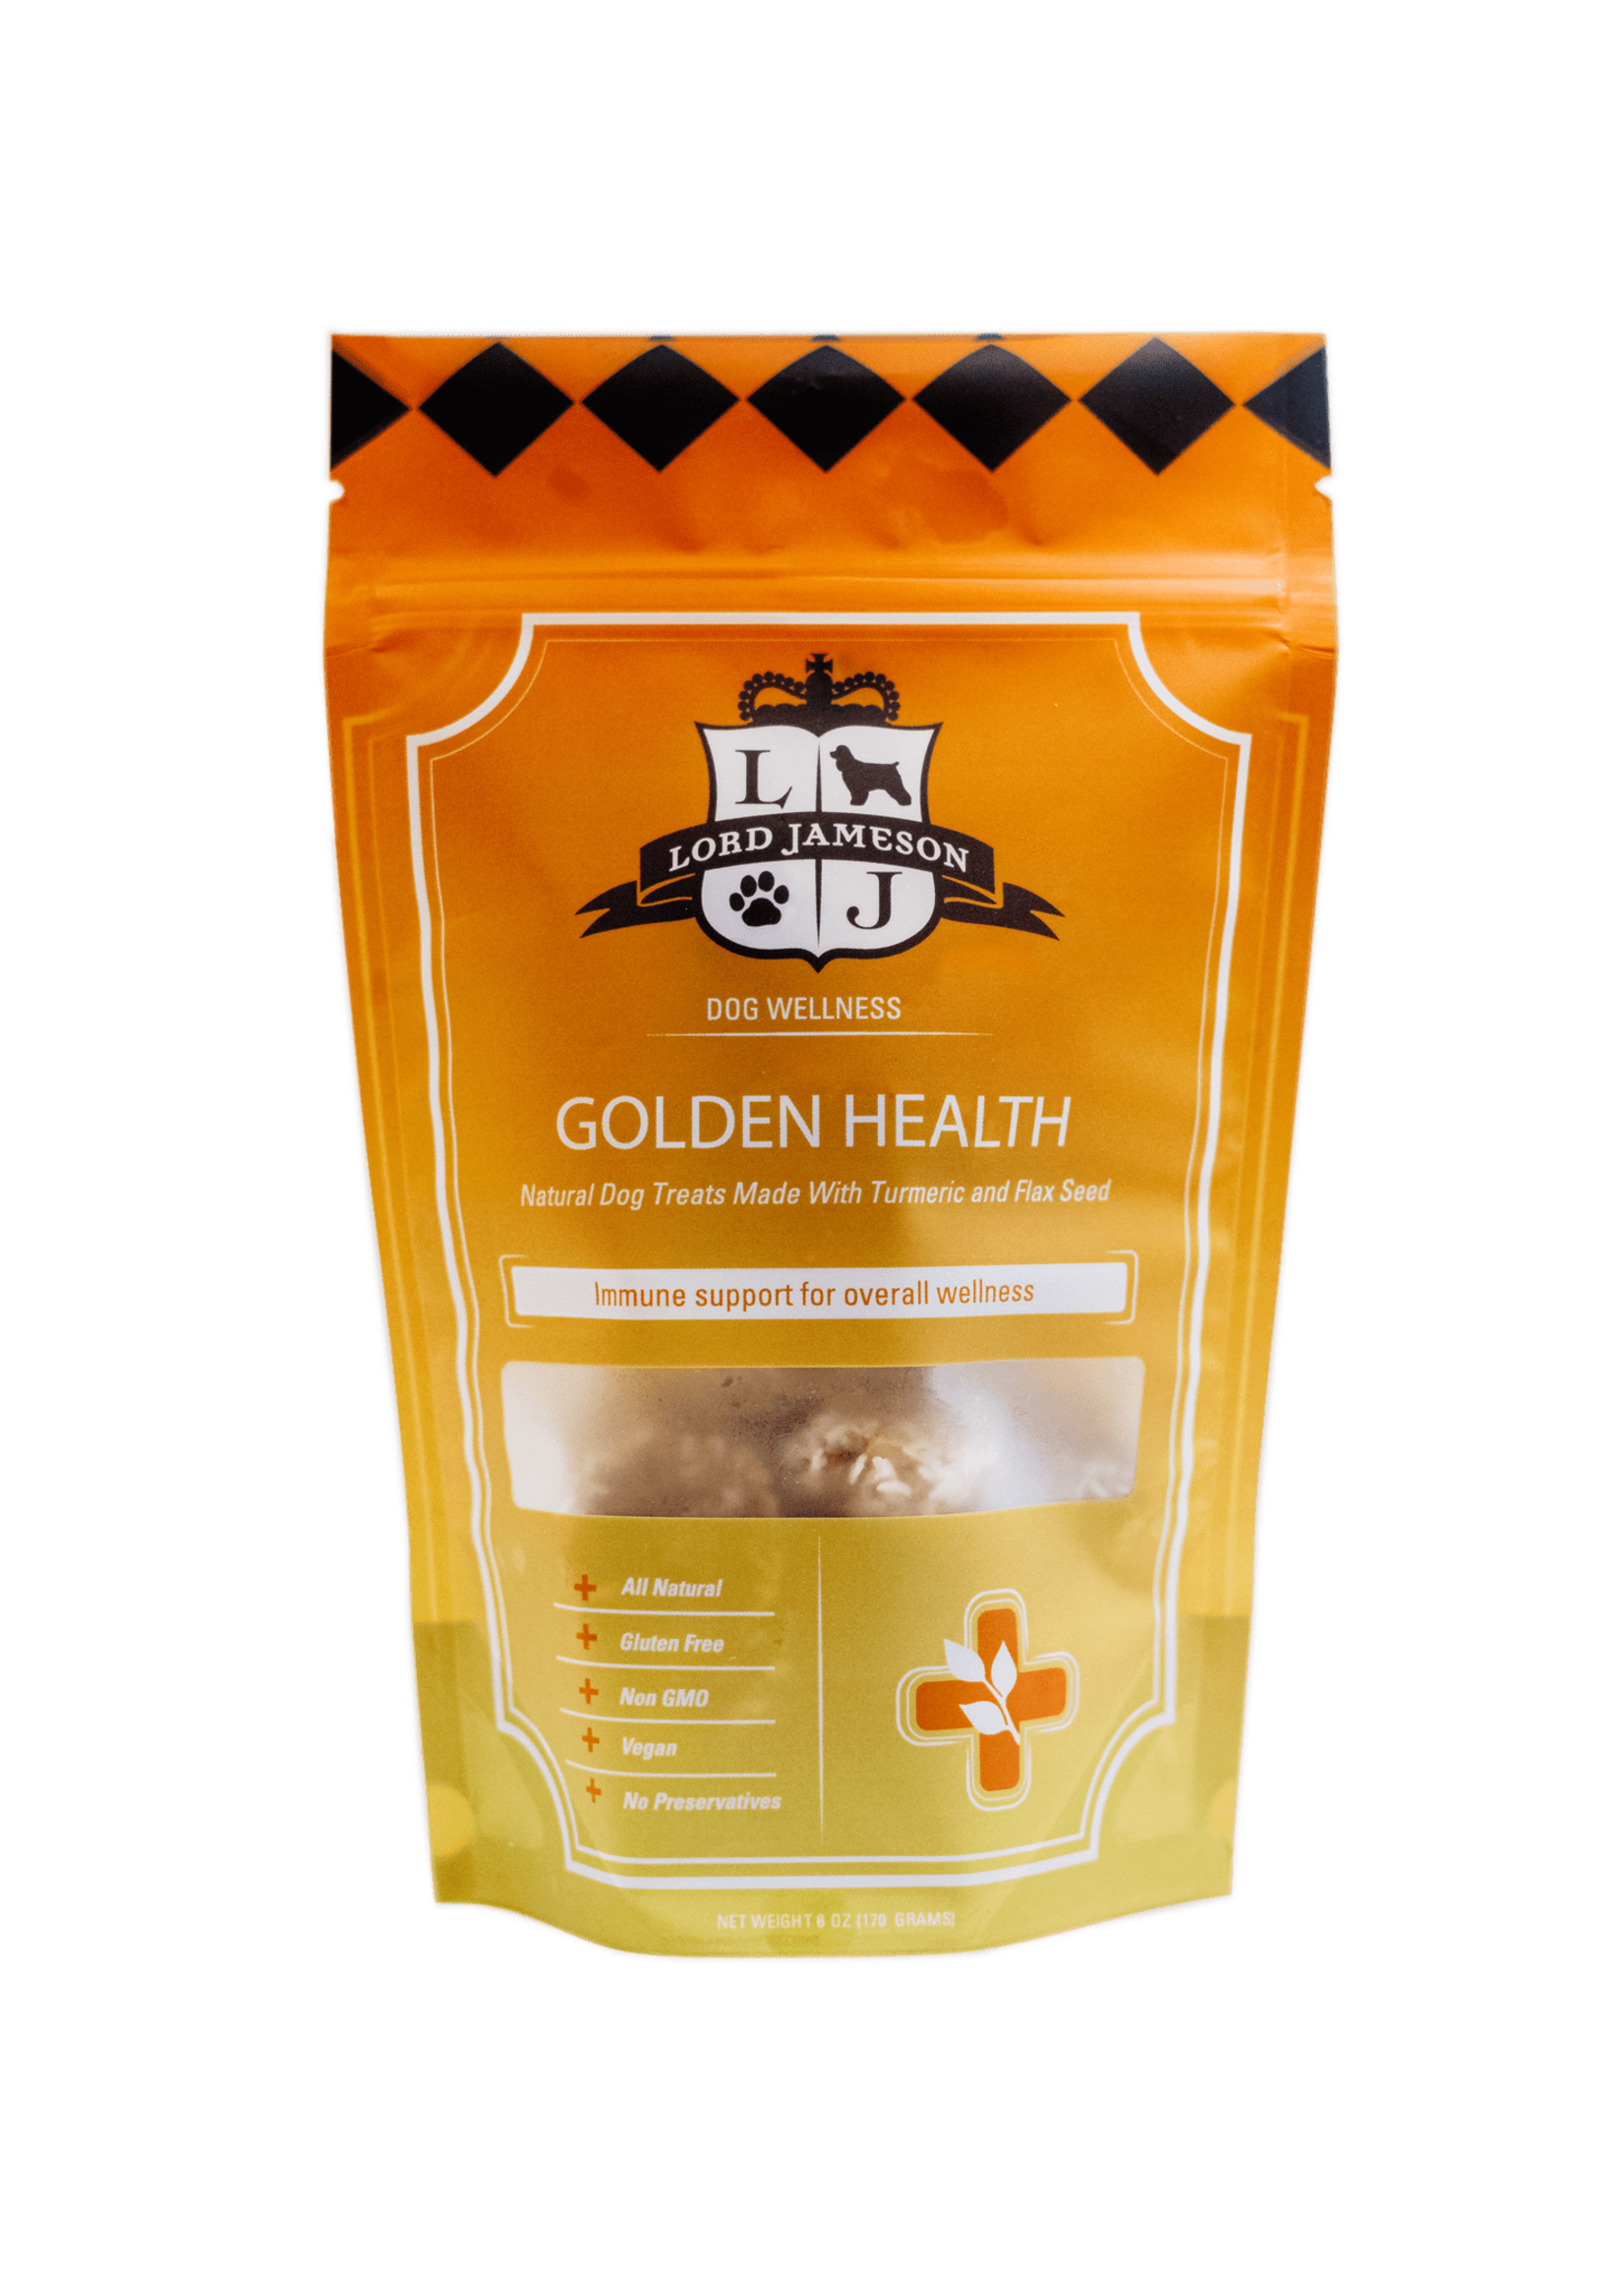 Lord Jameson Lord Jameson Golden Health 6 oz